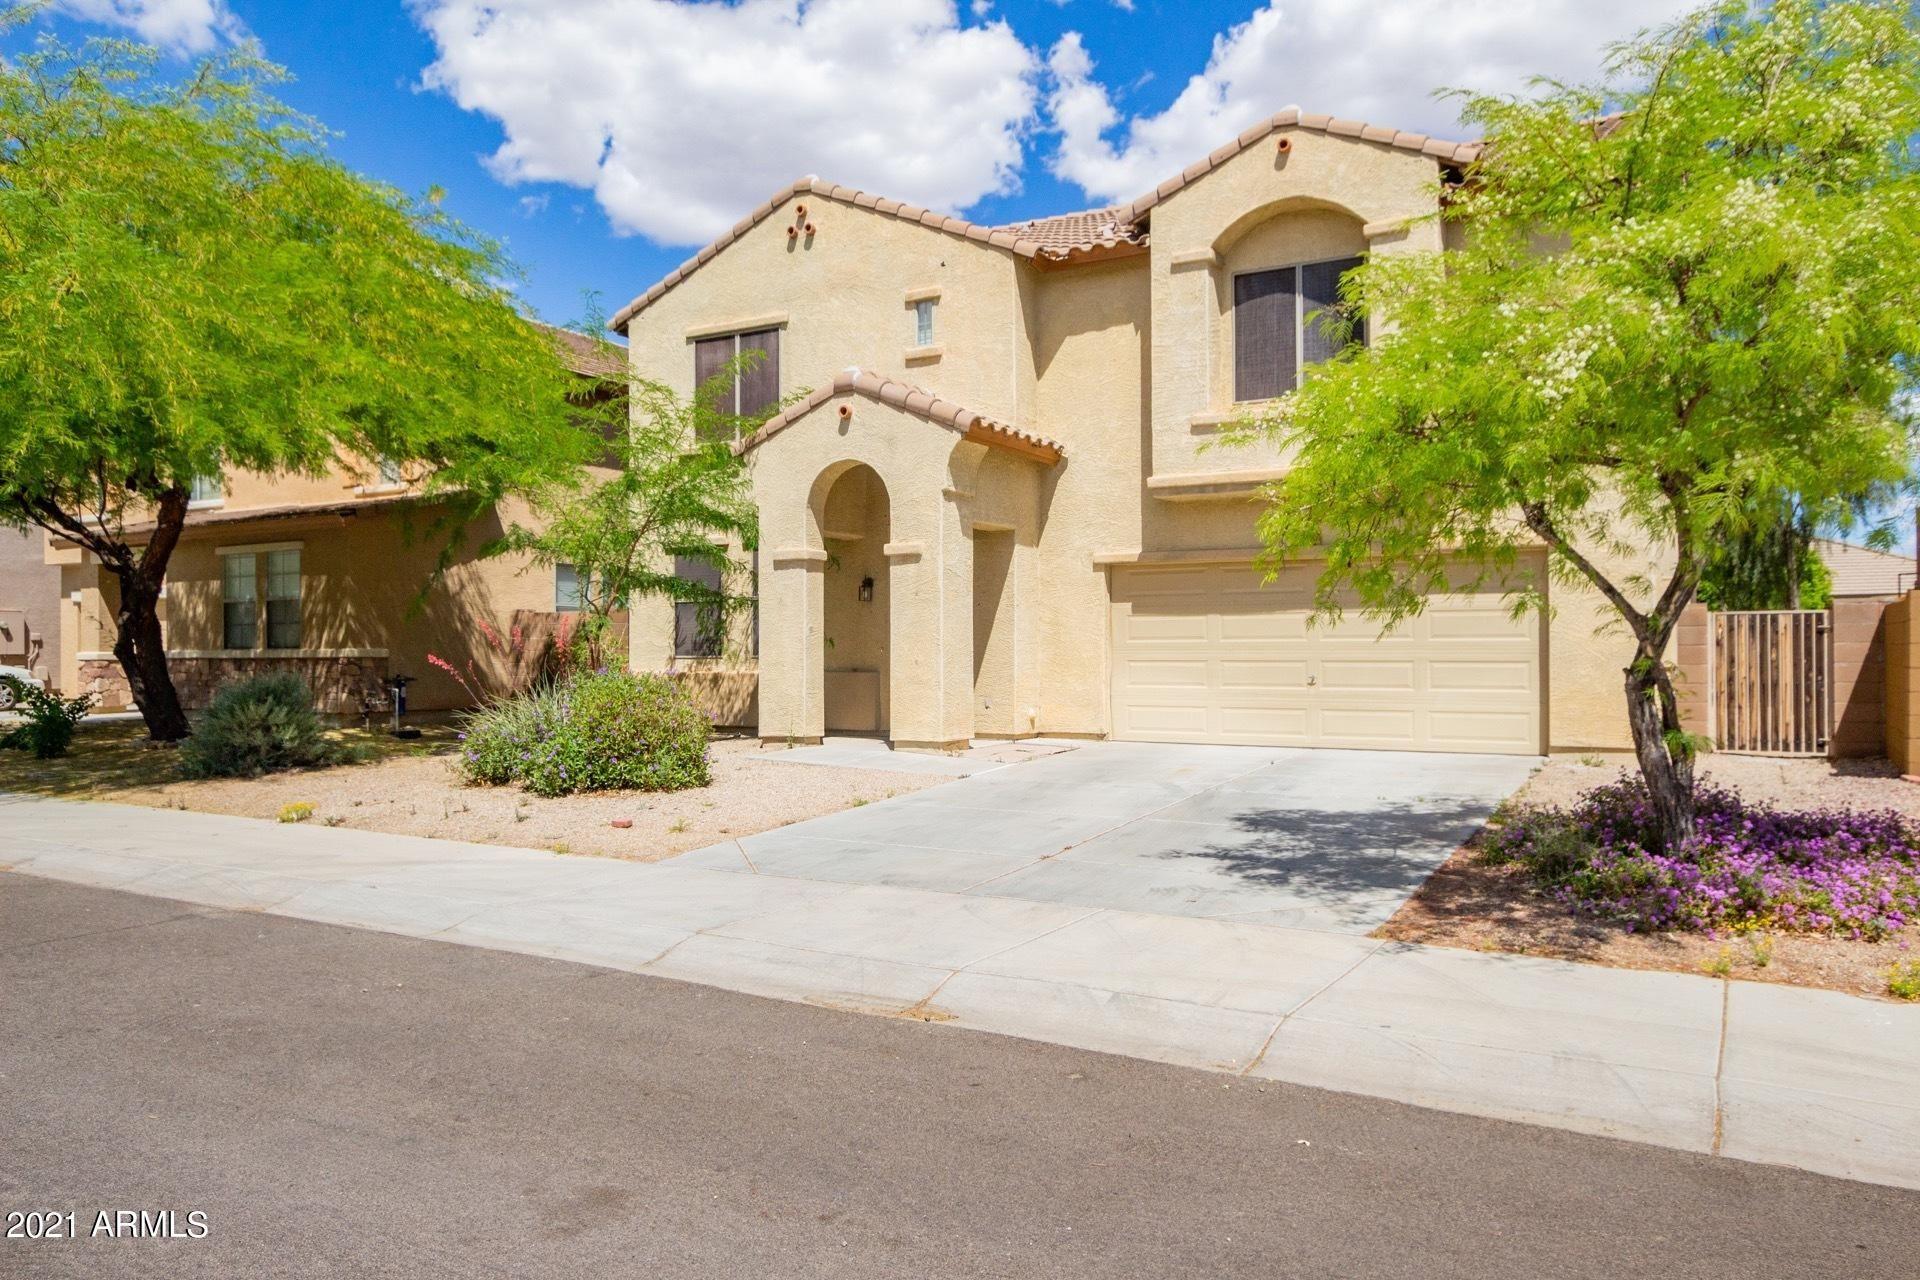 Photo of 23227 N 121ST Drive, Sun City, AZ 85373 (MLS # 6230449)